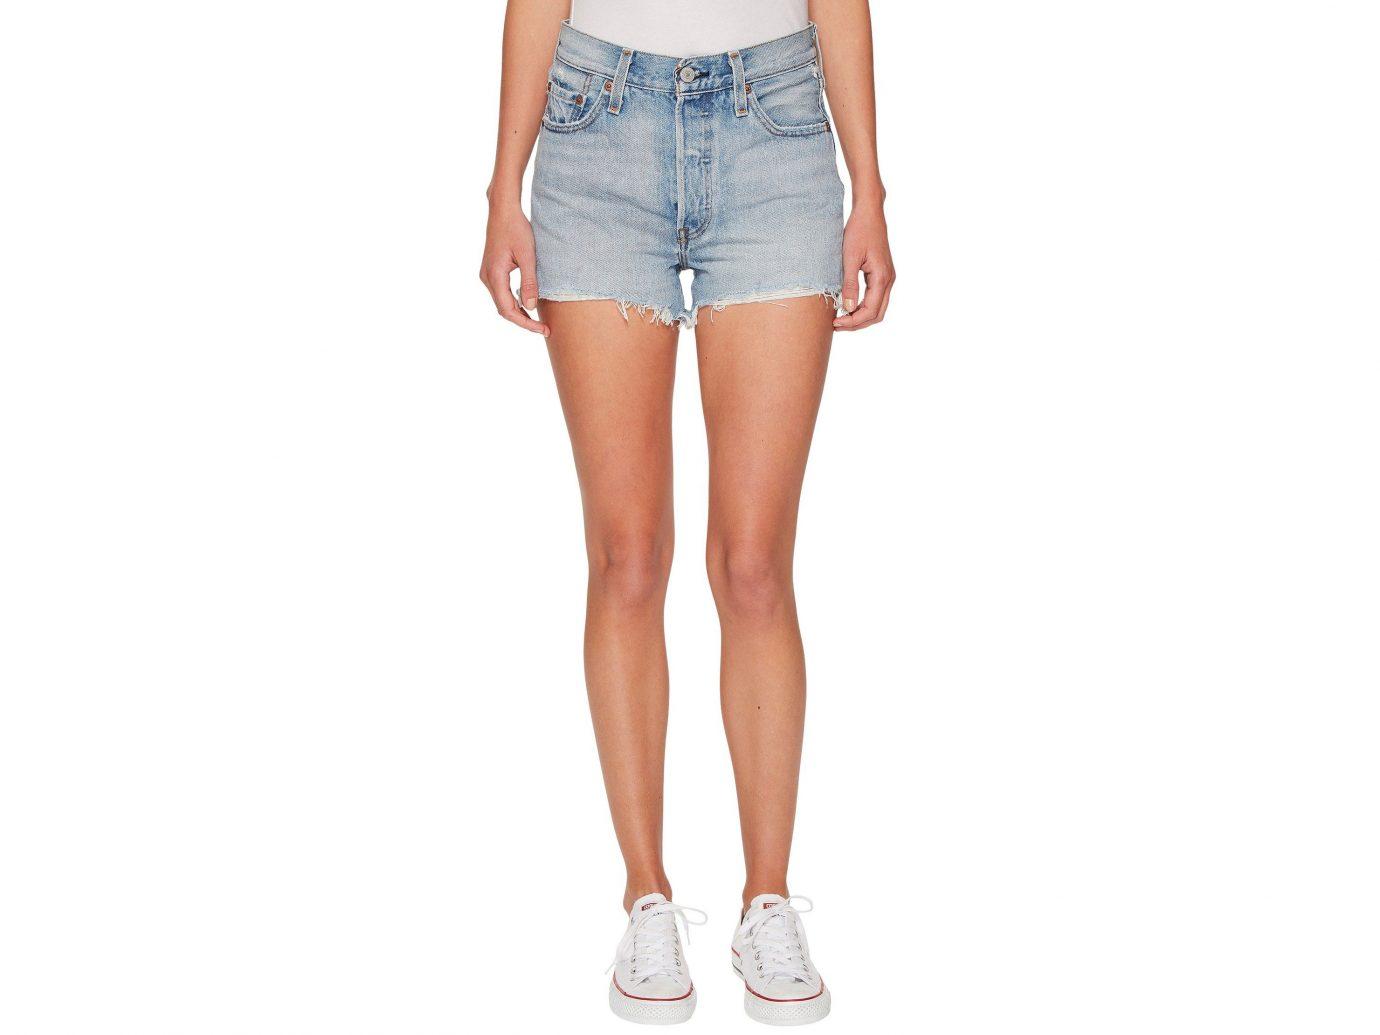 Levi's Women's 501 High-Rise Shorts